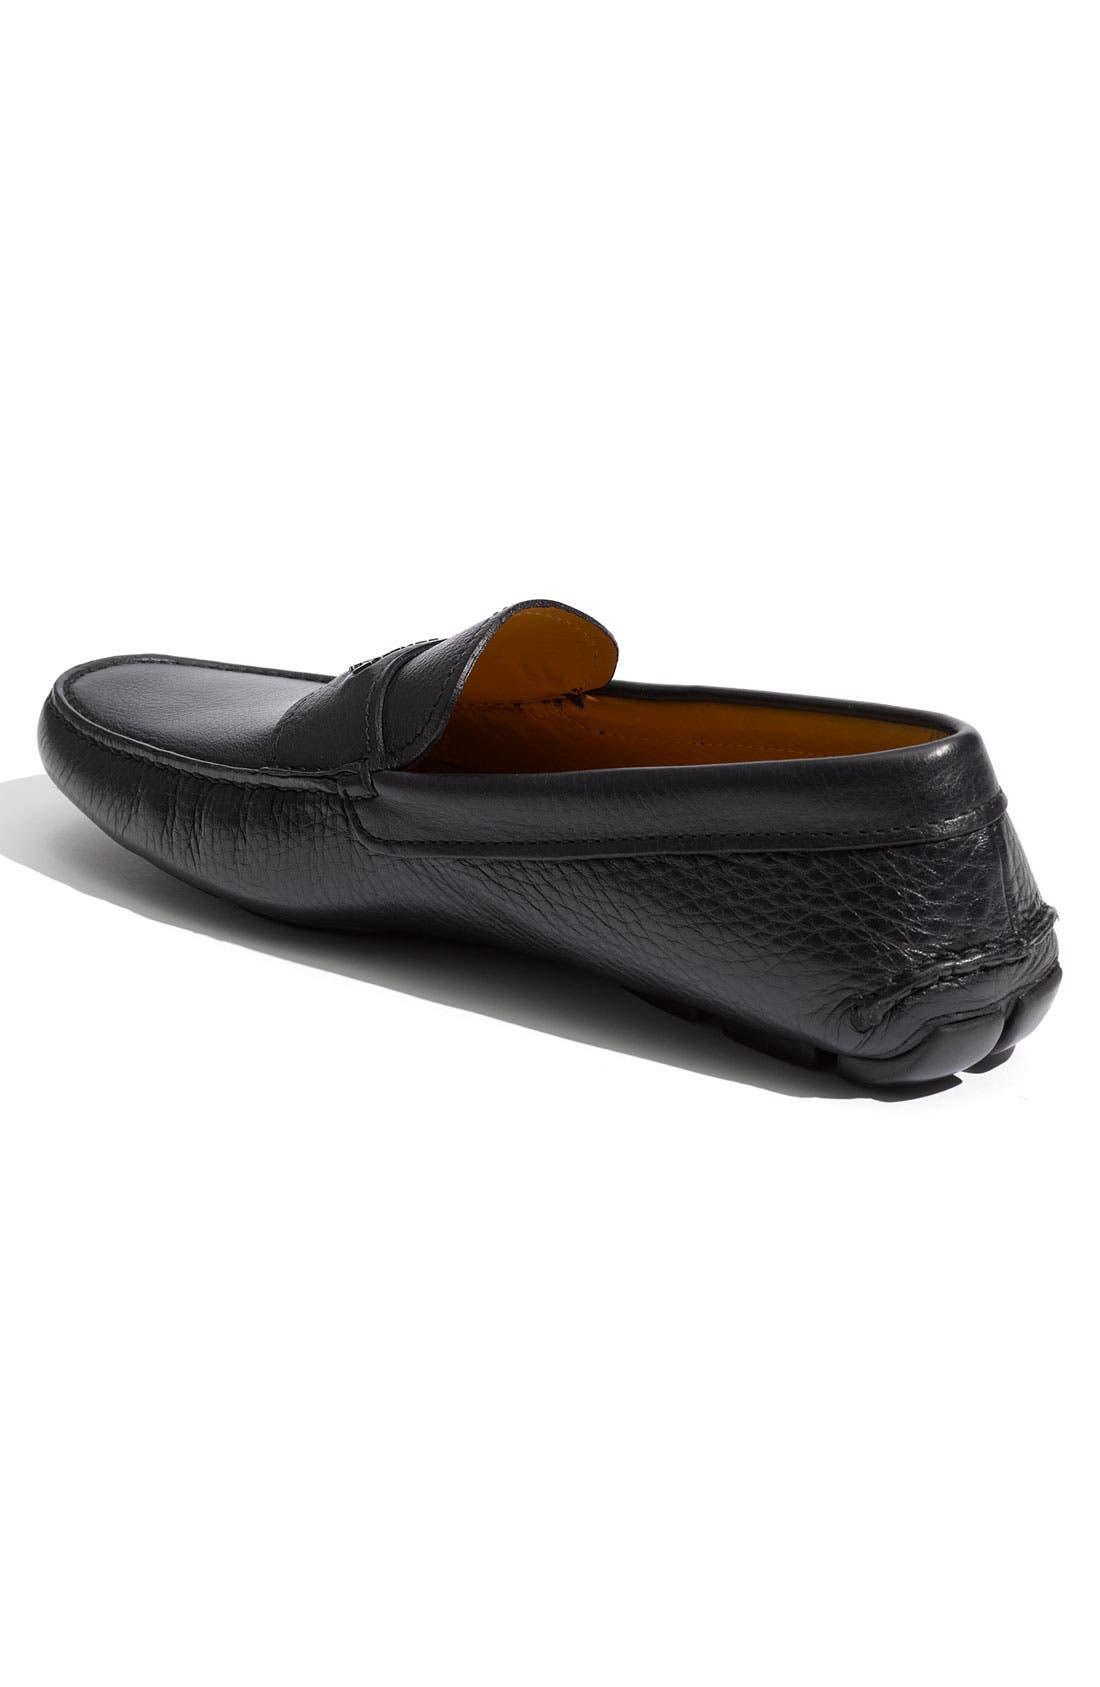 Alternate Image 2  - Prada Driving Shoe (Men)